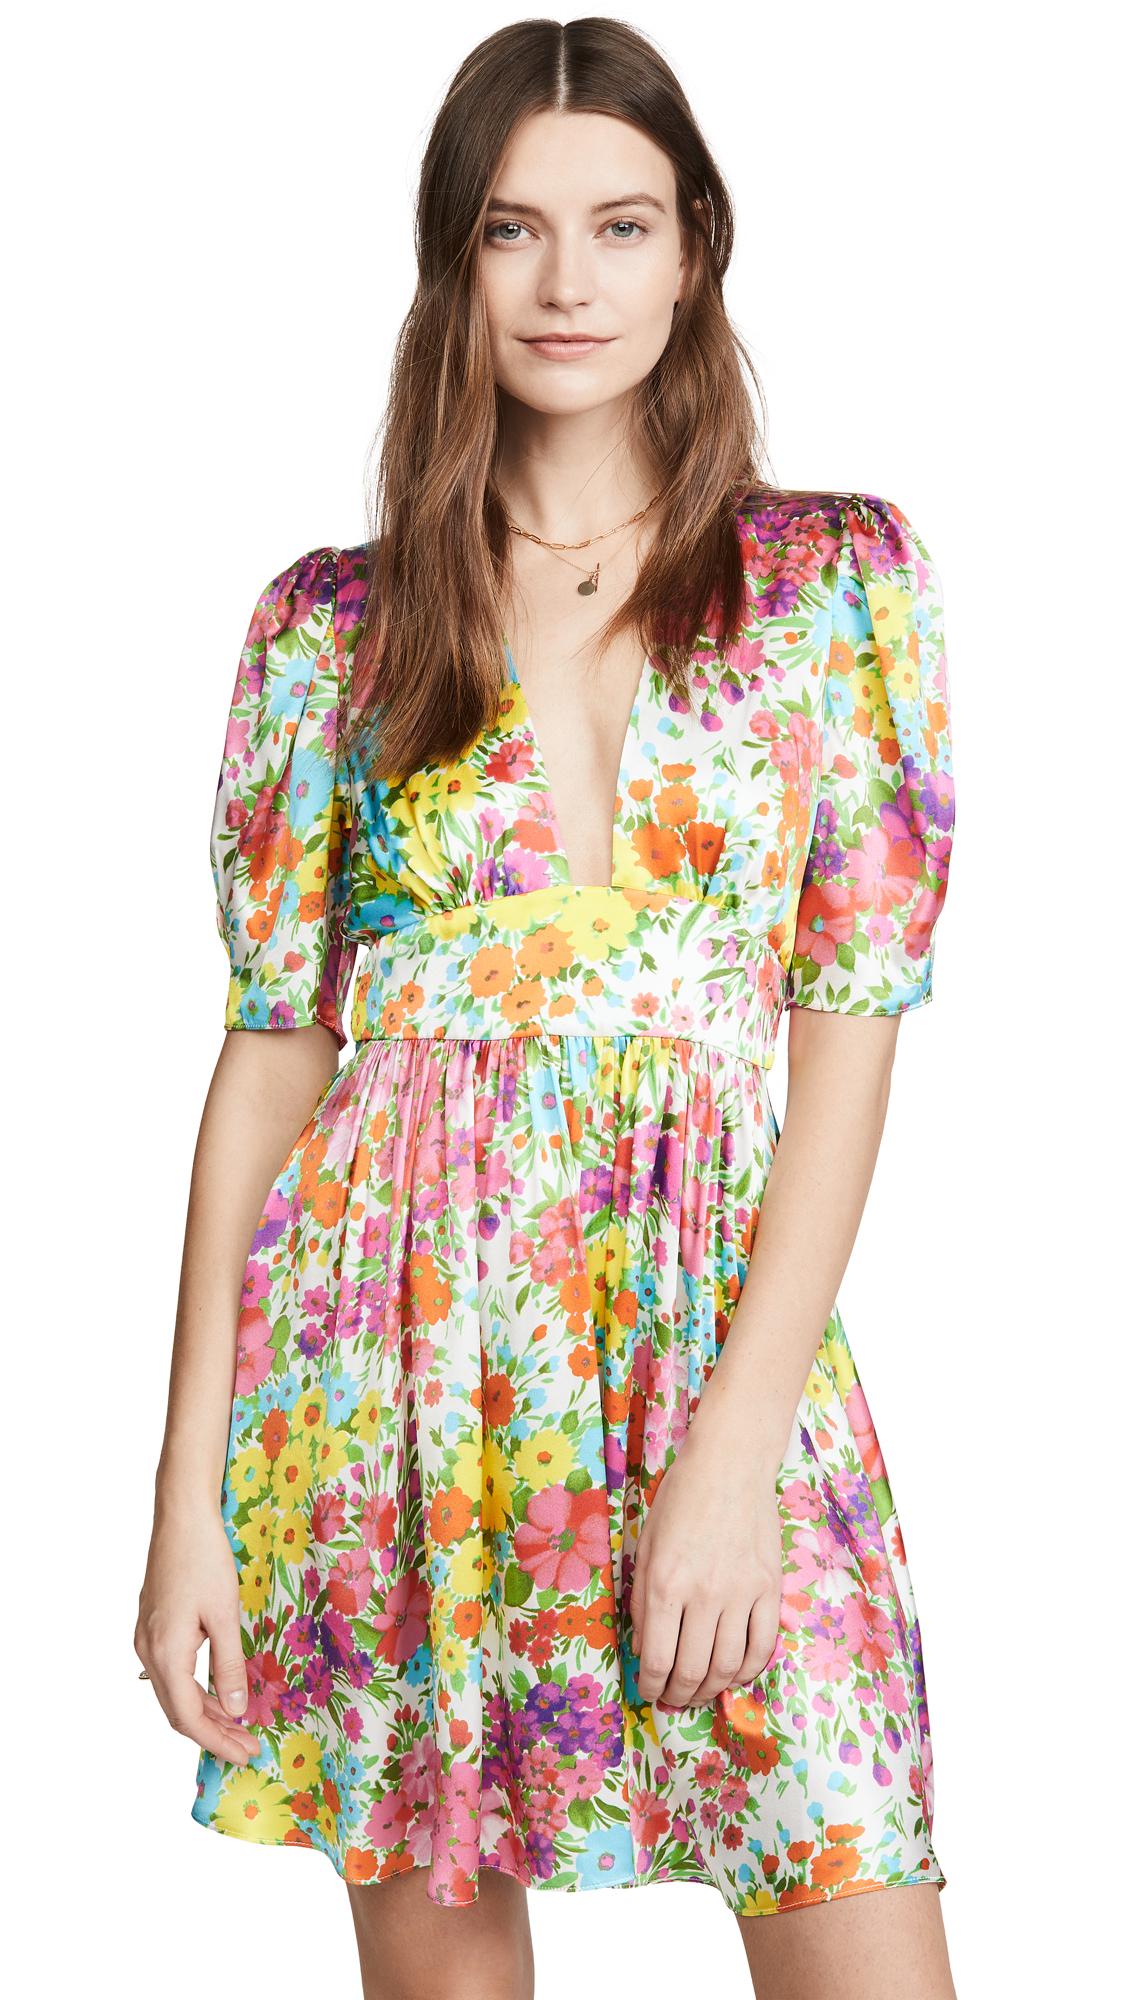 LES REVERIES Gigi Mini Dress - 70% Off Sale